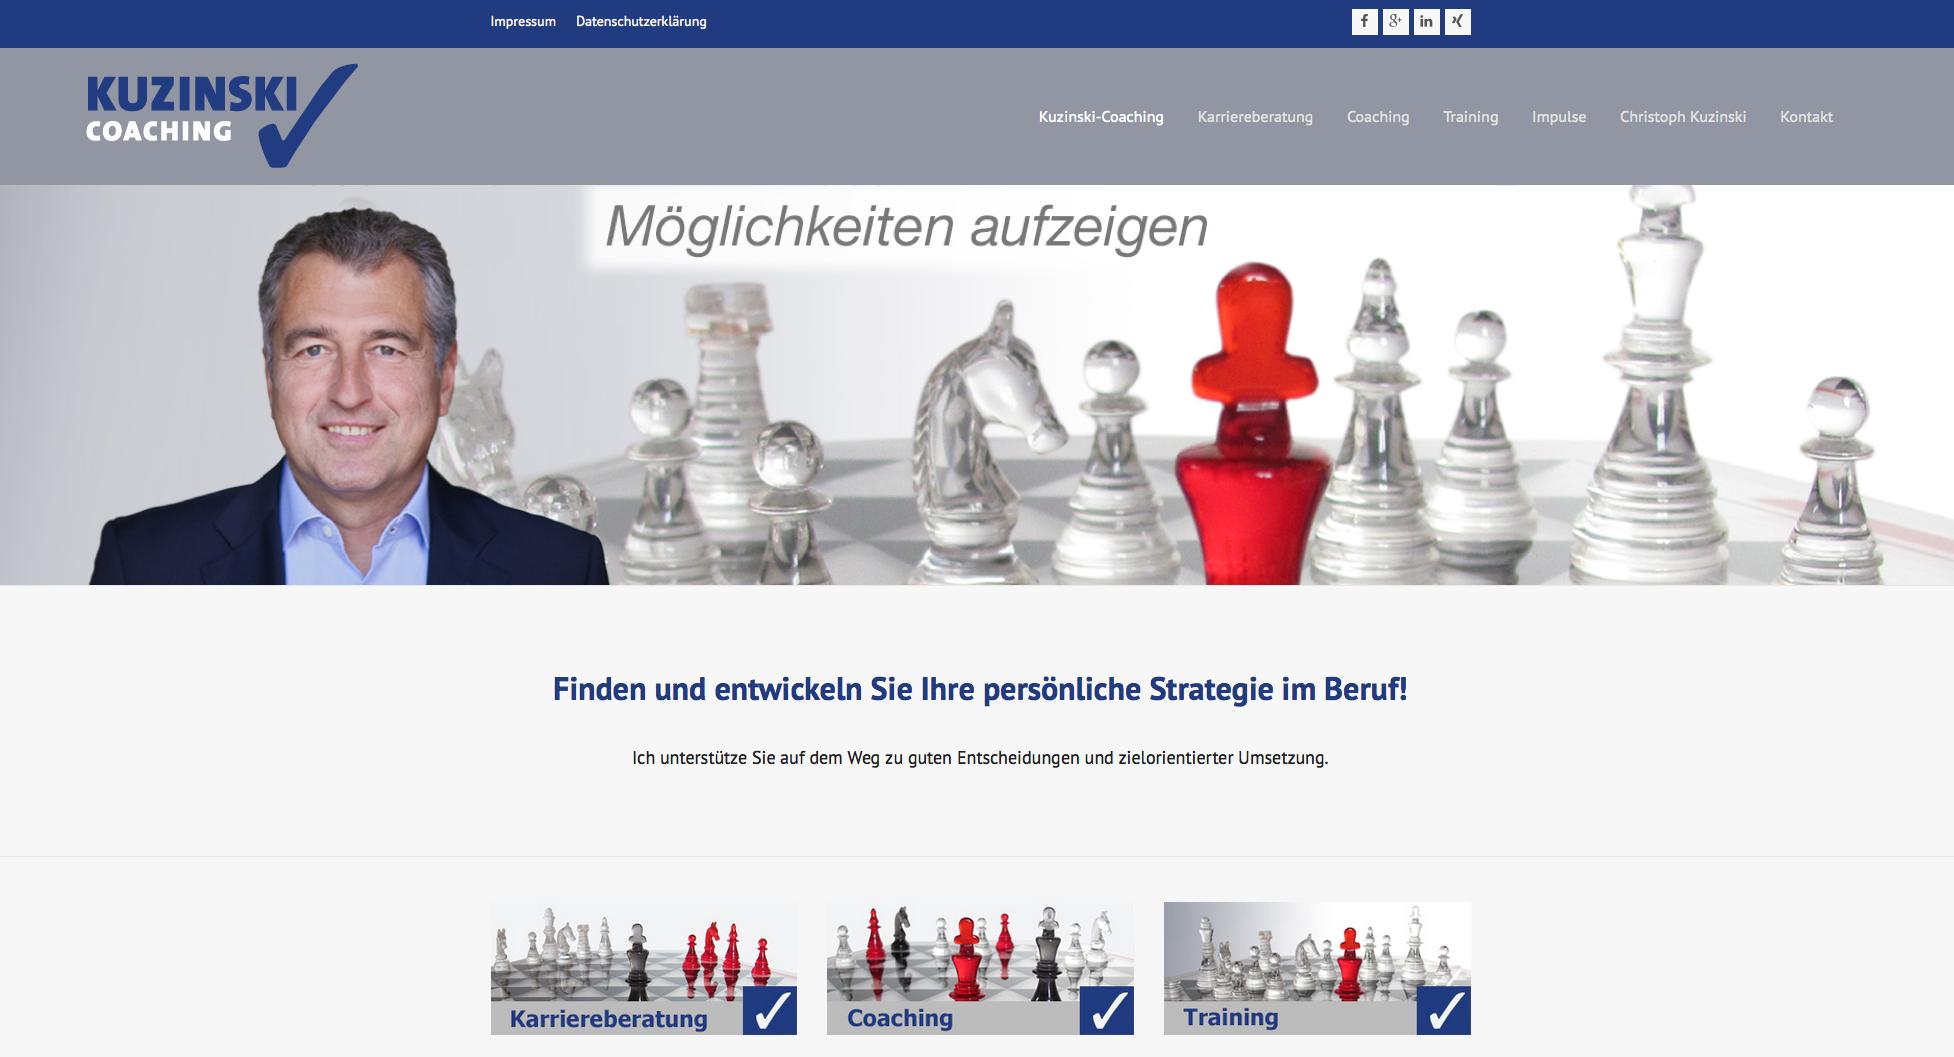 Kuzinski-Coaching, Wiesbaden / Frankfurt